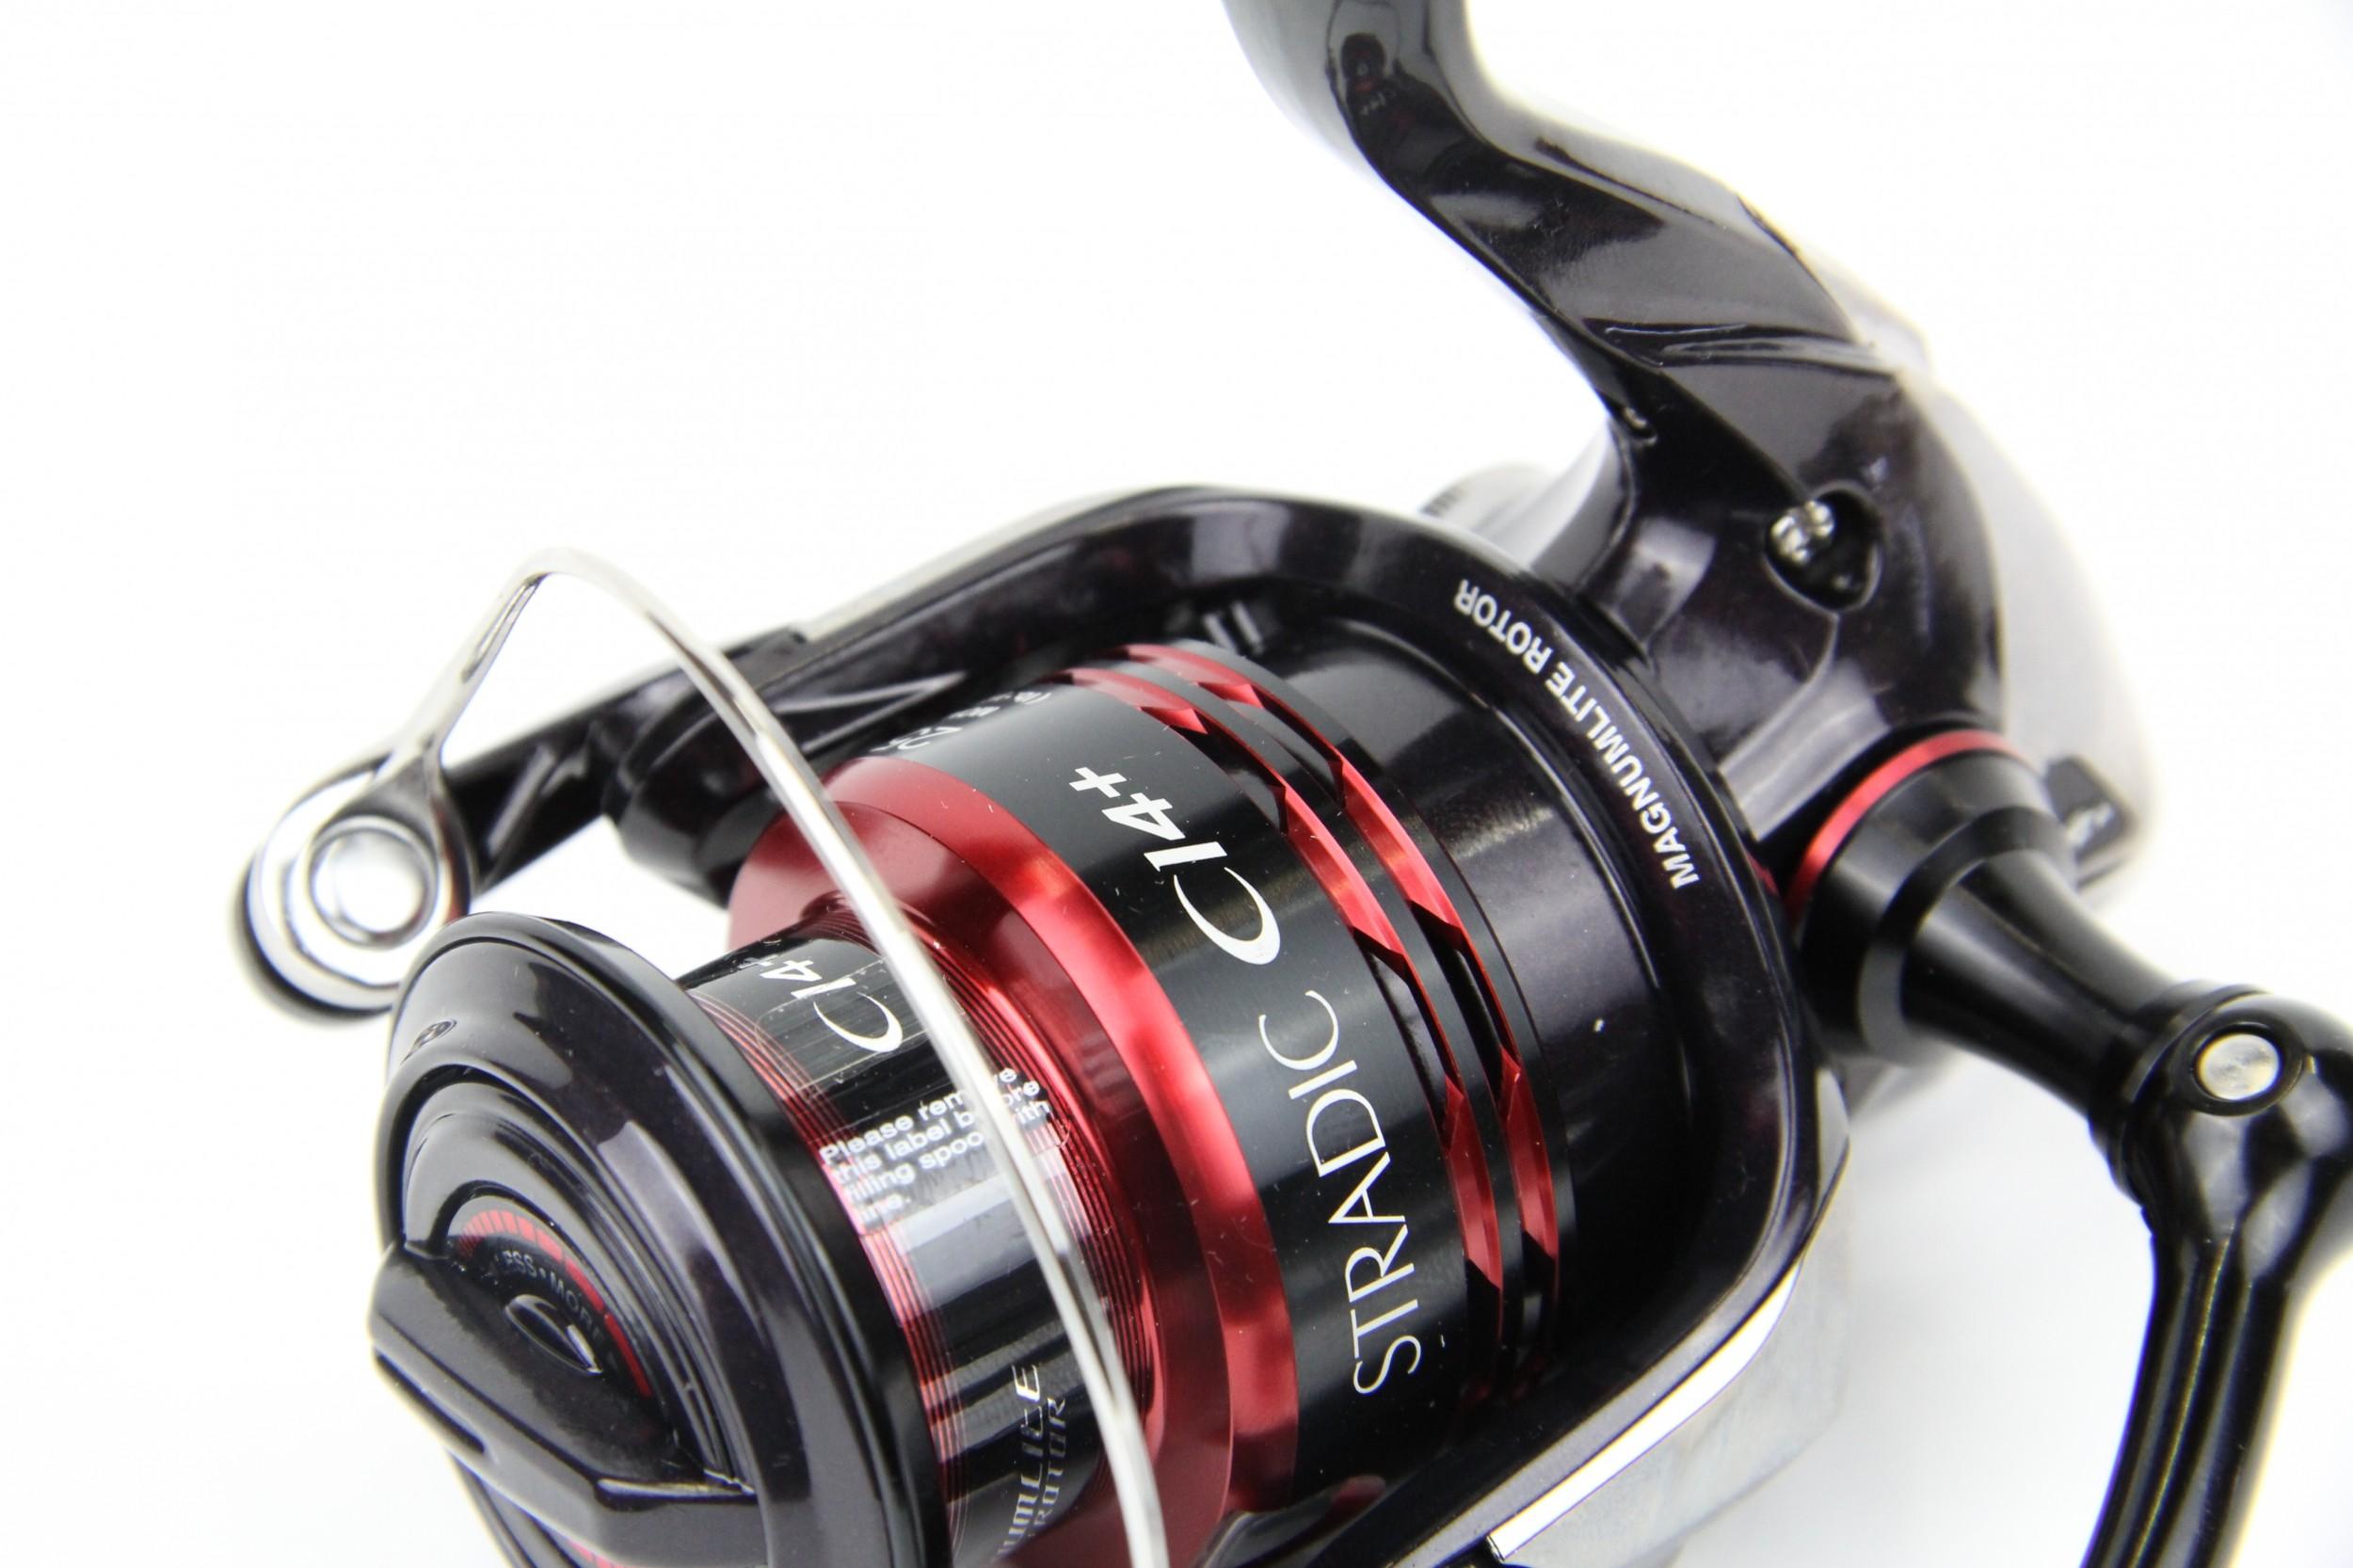 La pêche au leurre avec le shimano straidc ci4+